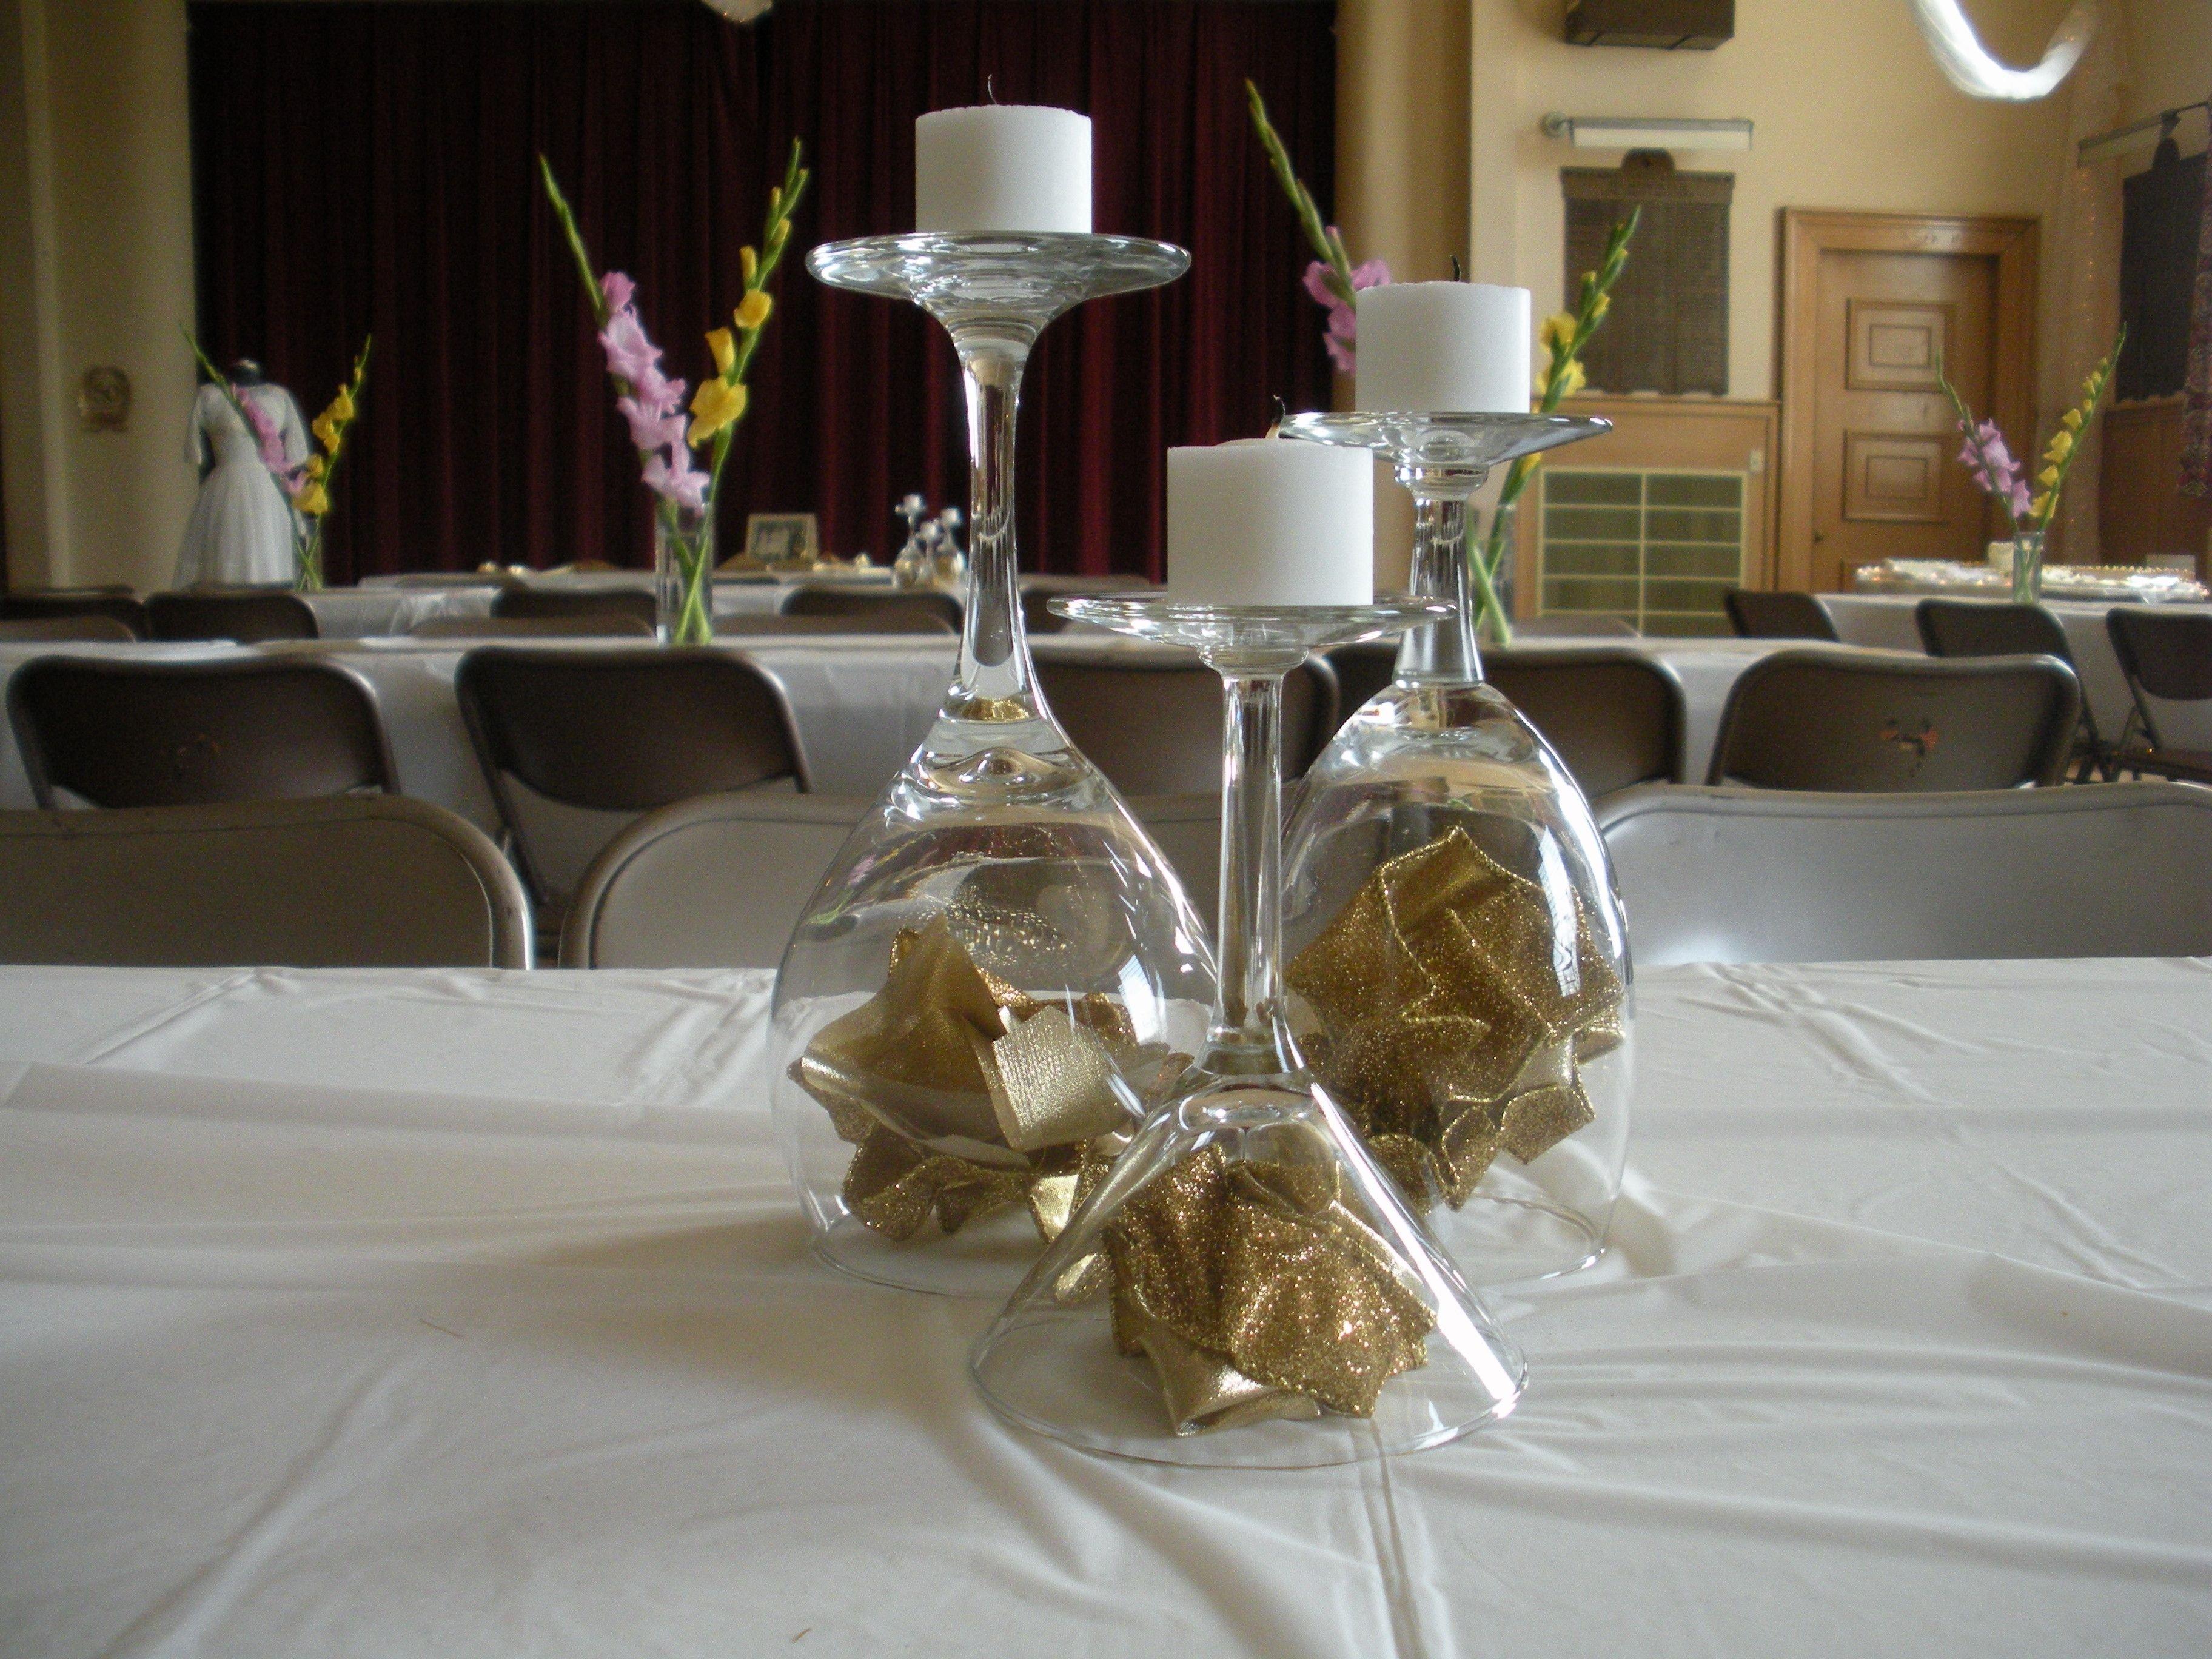 10 Stunning 50 Wedding Anniversary Party Ideas decorations for golden wedding anniversary 50th wedding anniversary 1 2021